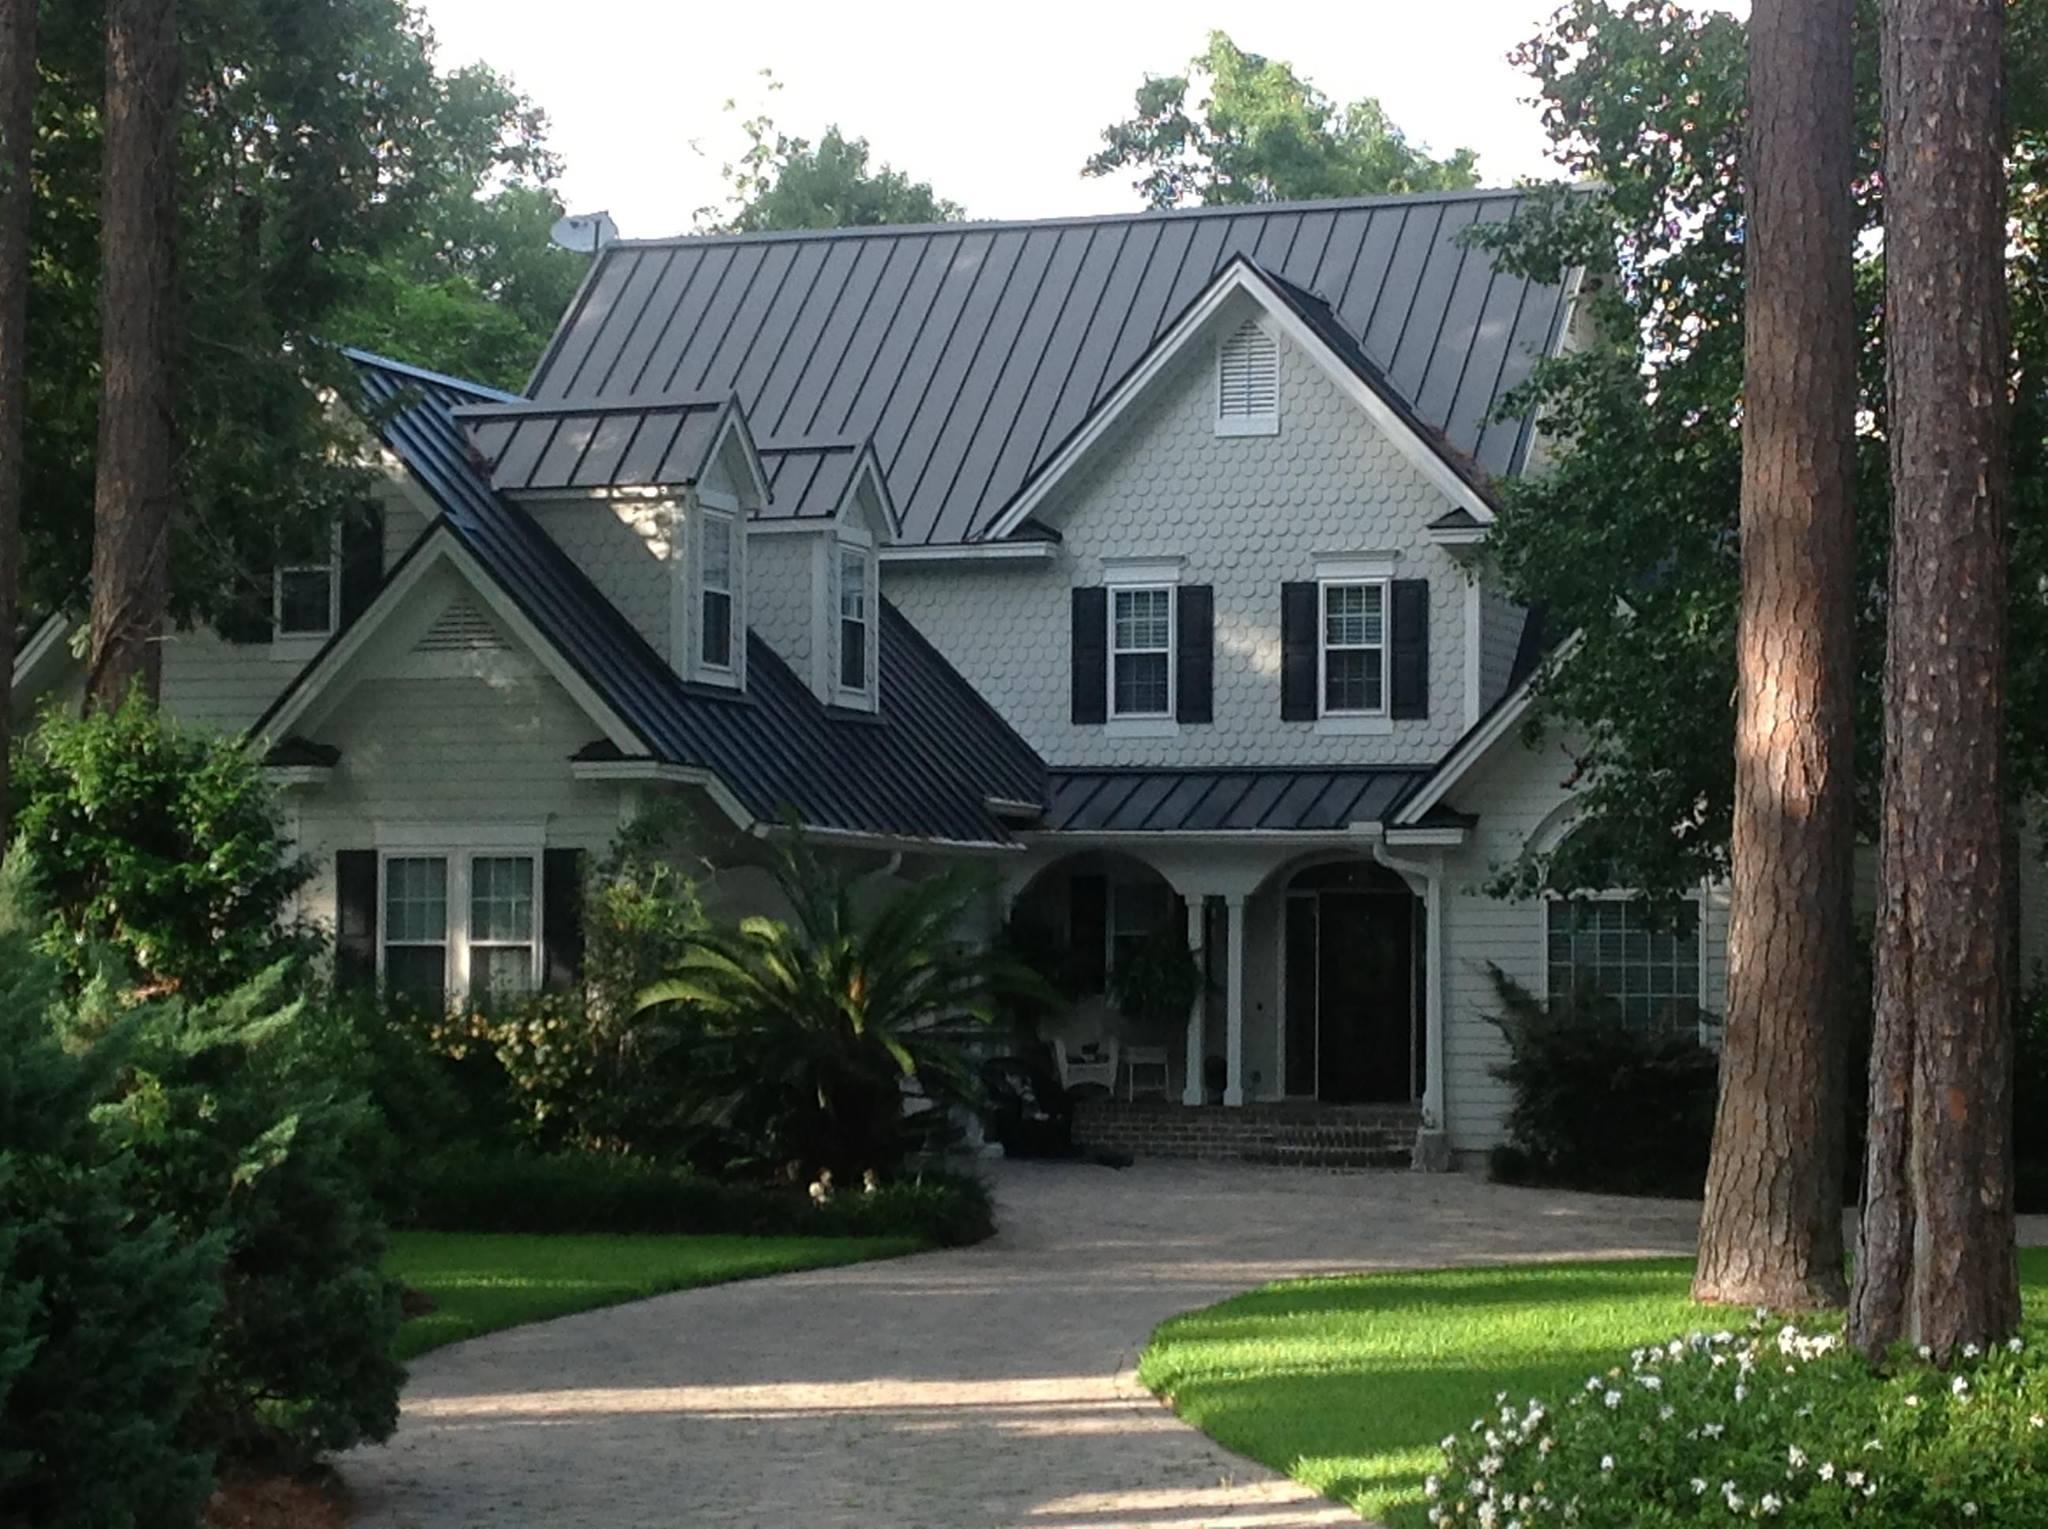 RoofCrafters-Savannah image 32